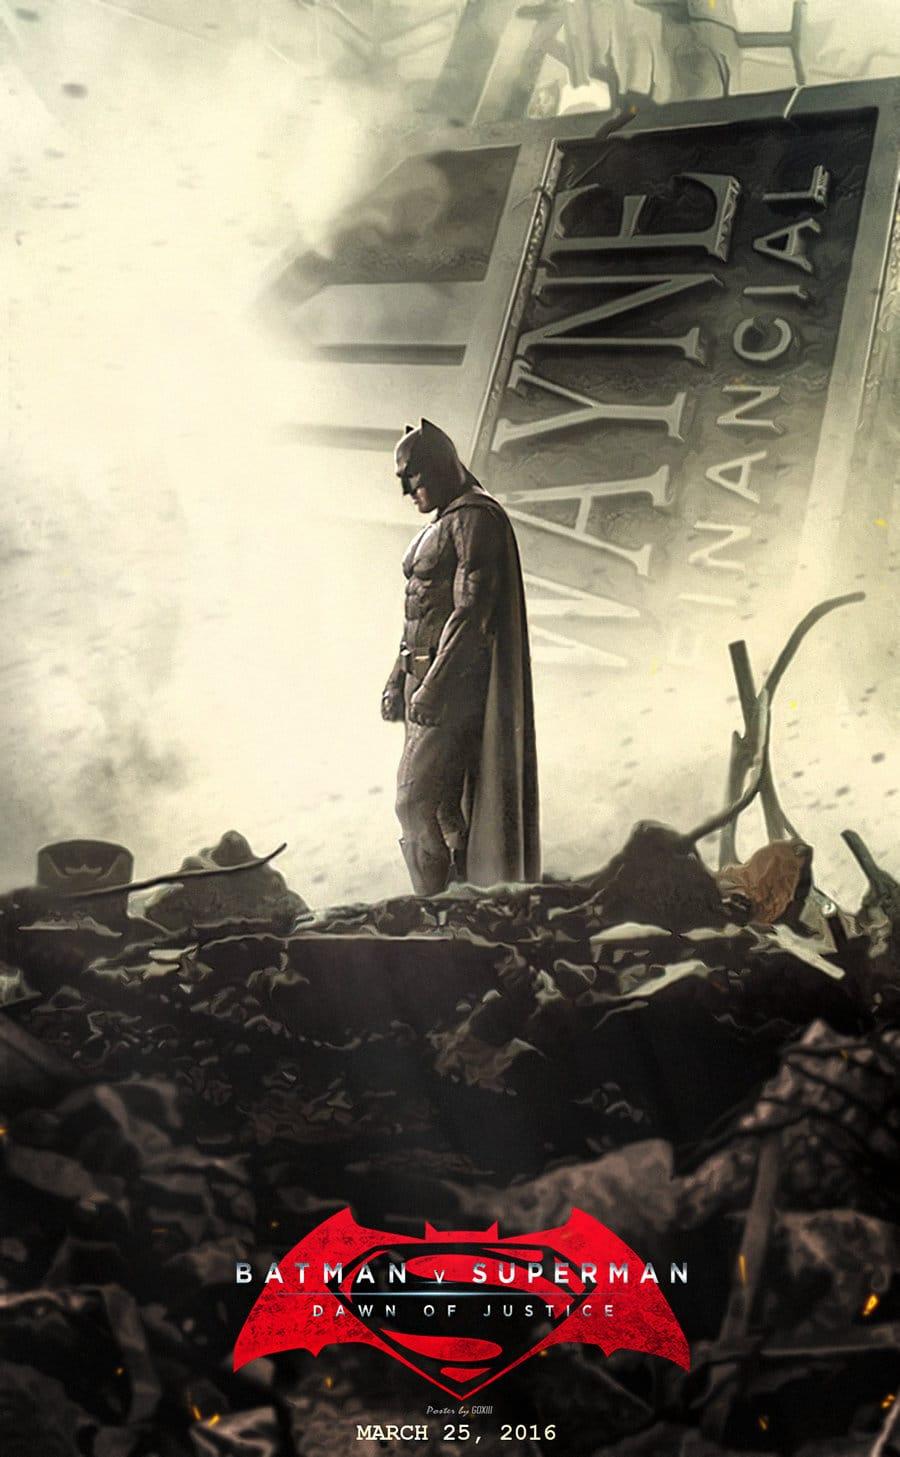 Batman-Vs-Superman-Posters-hd-printable-batman-wayne-enterprise-collapsed